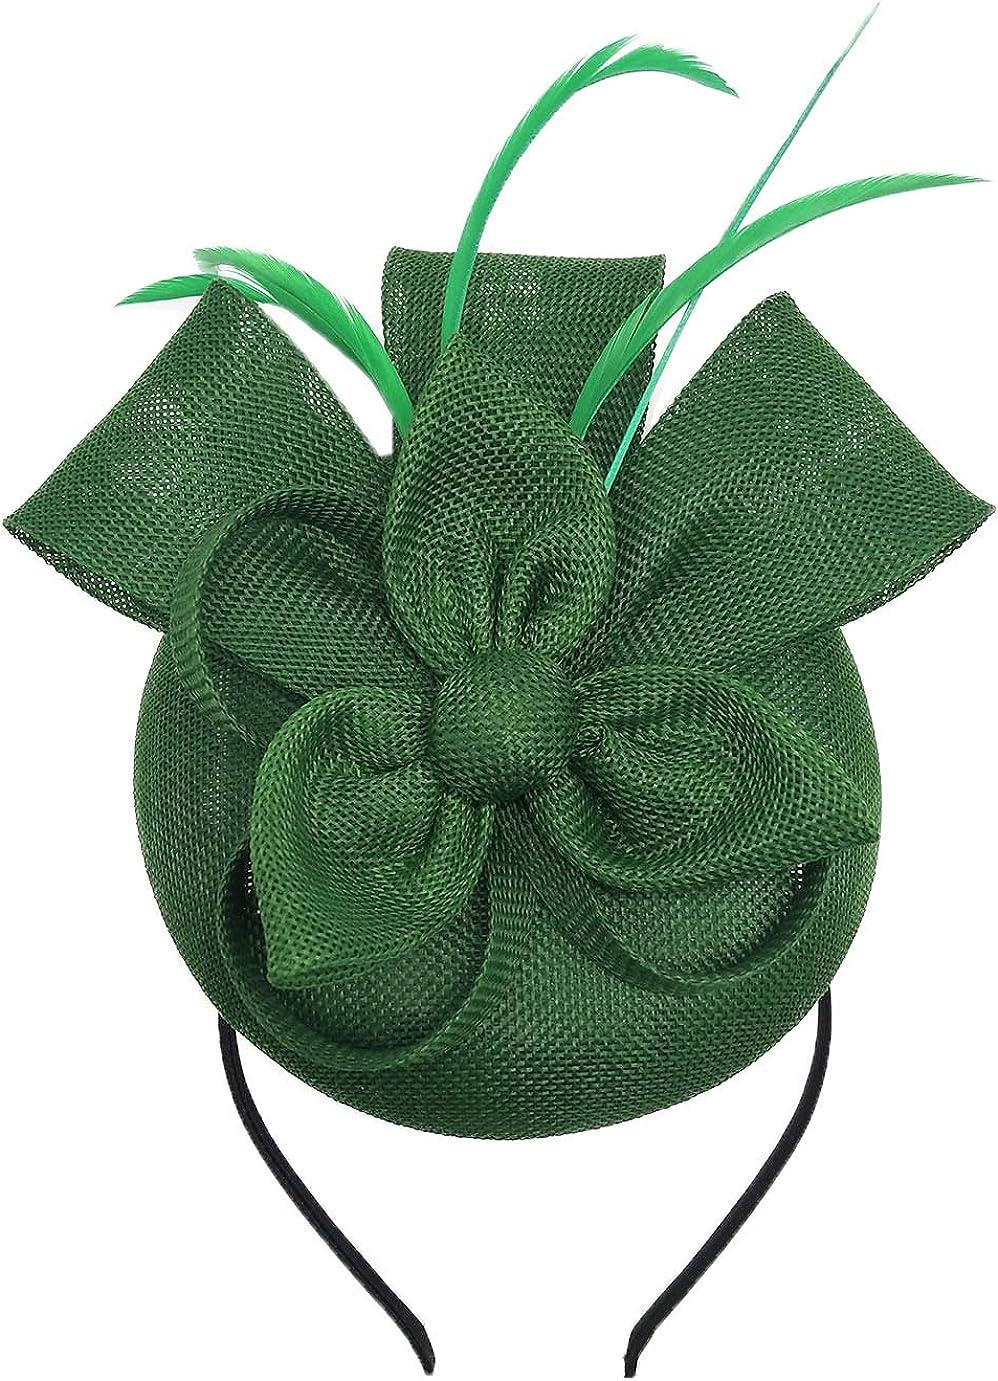 Biruil Fascinators Hat for Women Girls Sinamay Flower Feathers Tea Party Cocktail Headband Hair Clip